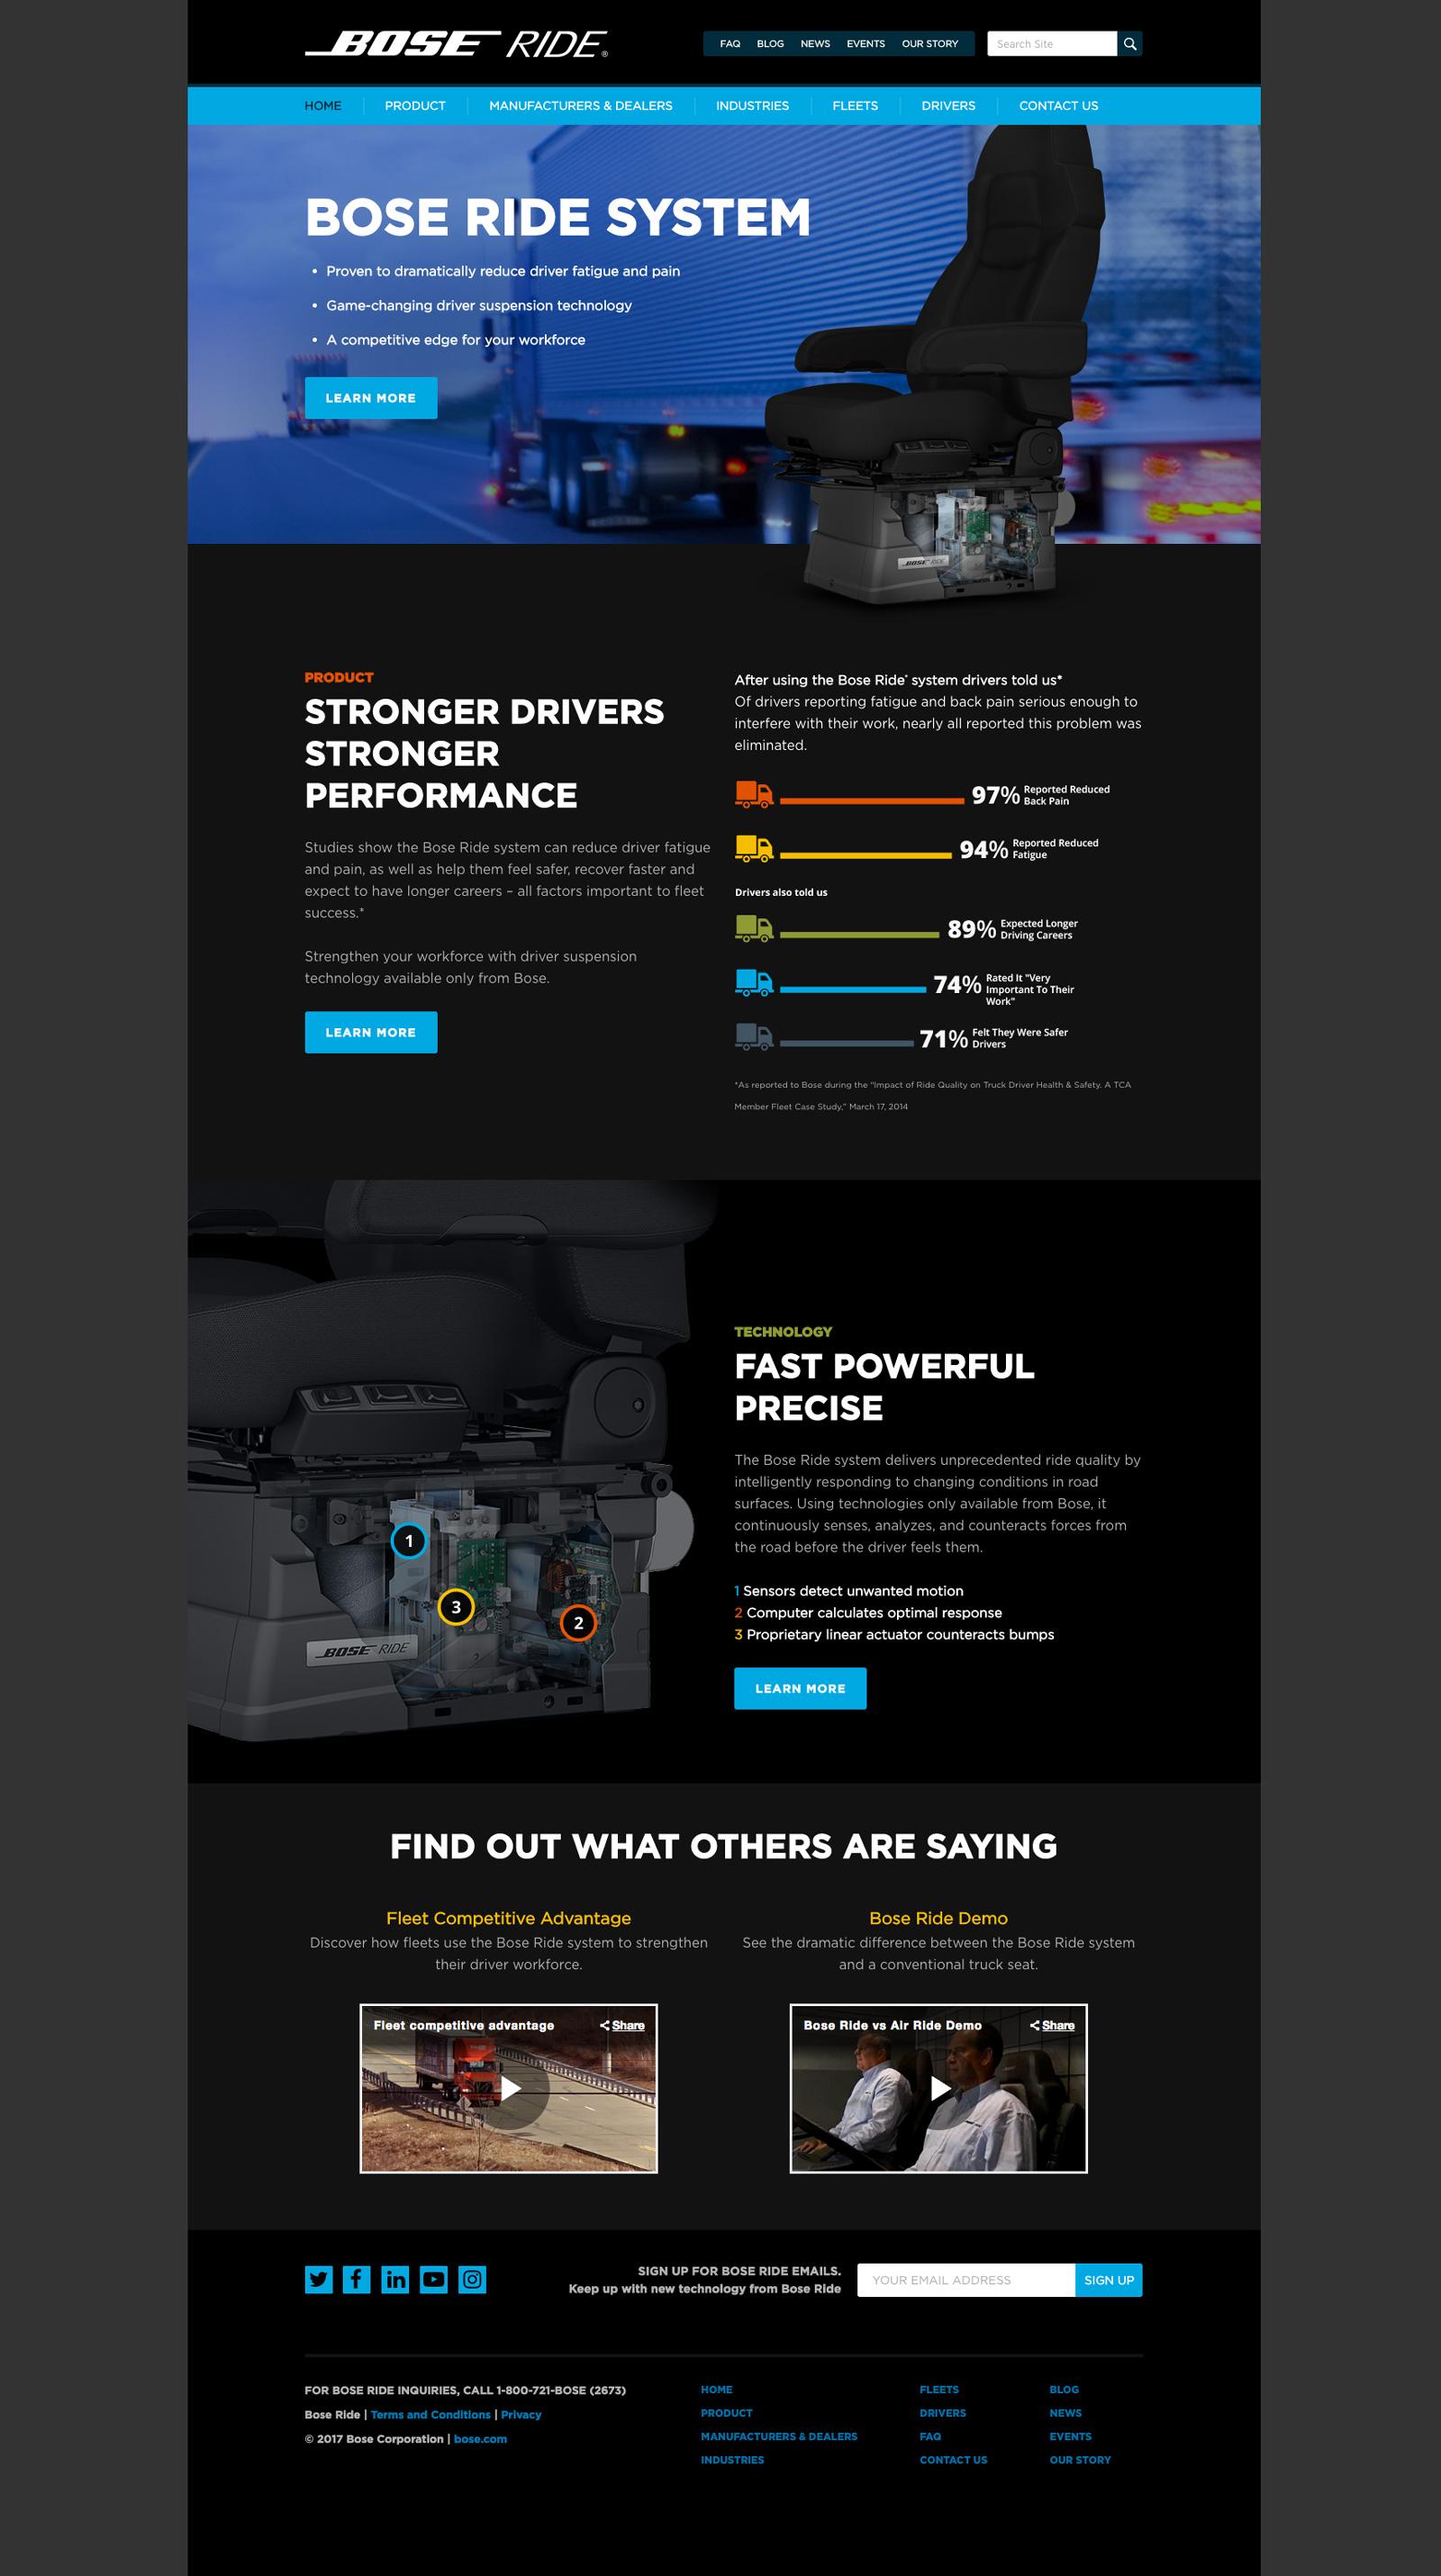 Bose Ride product marketing